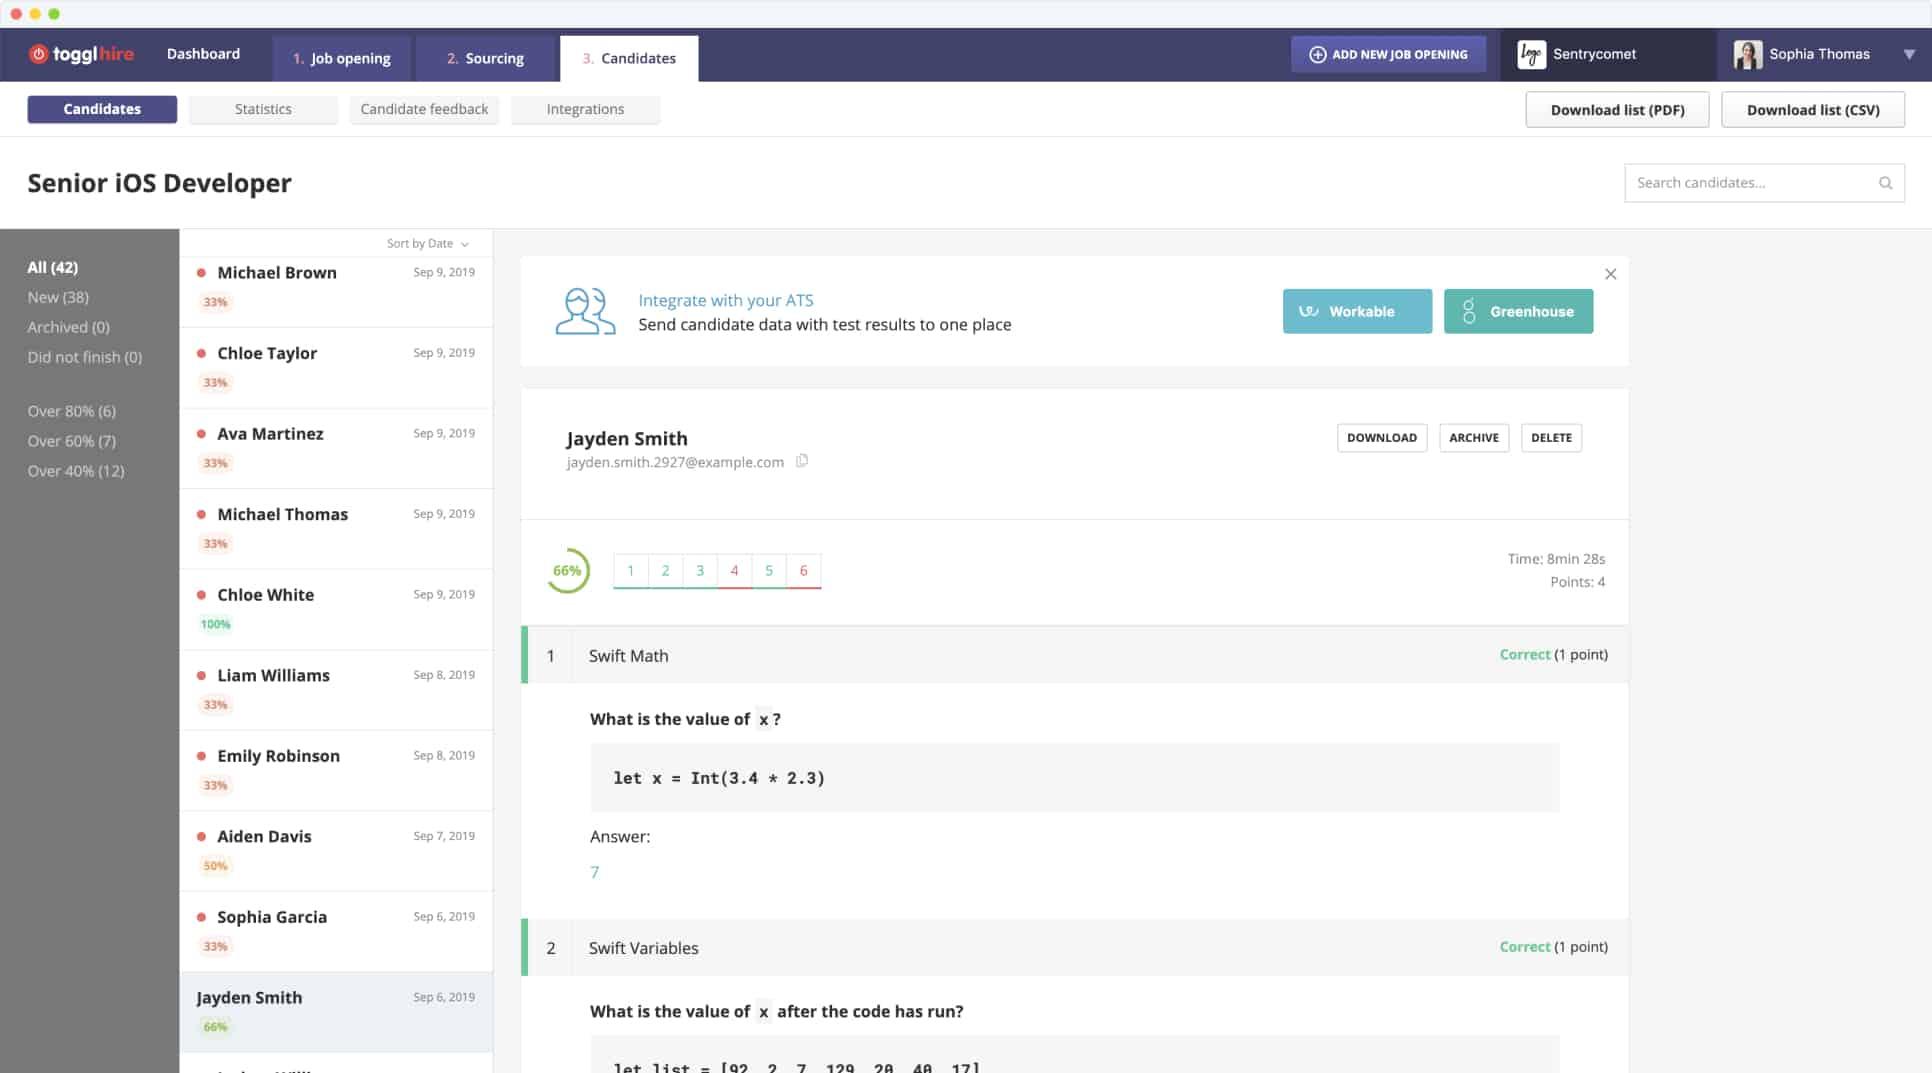 Toggl Hire Dashboard: Results